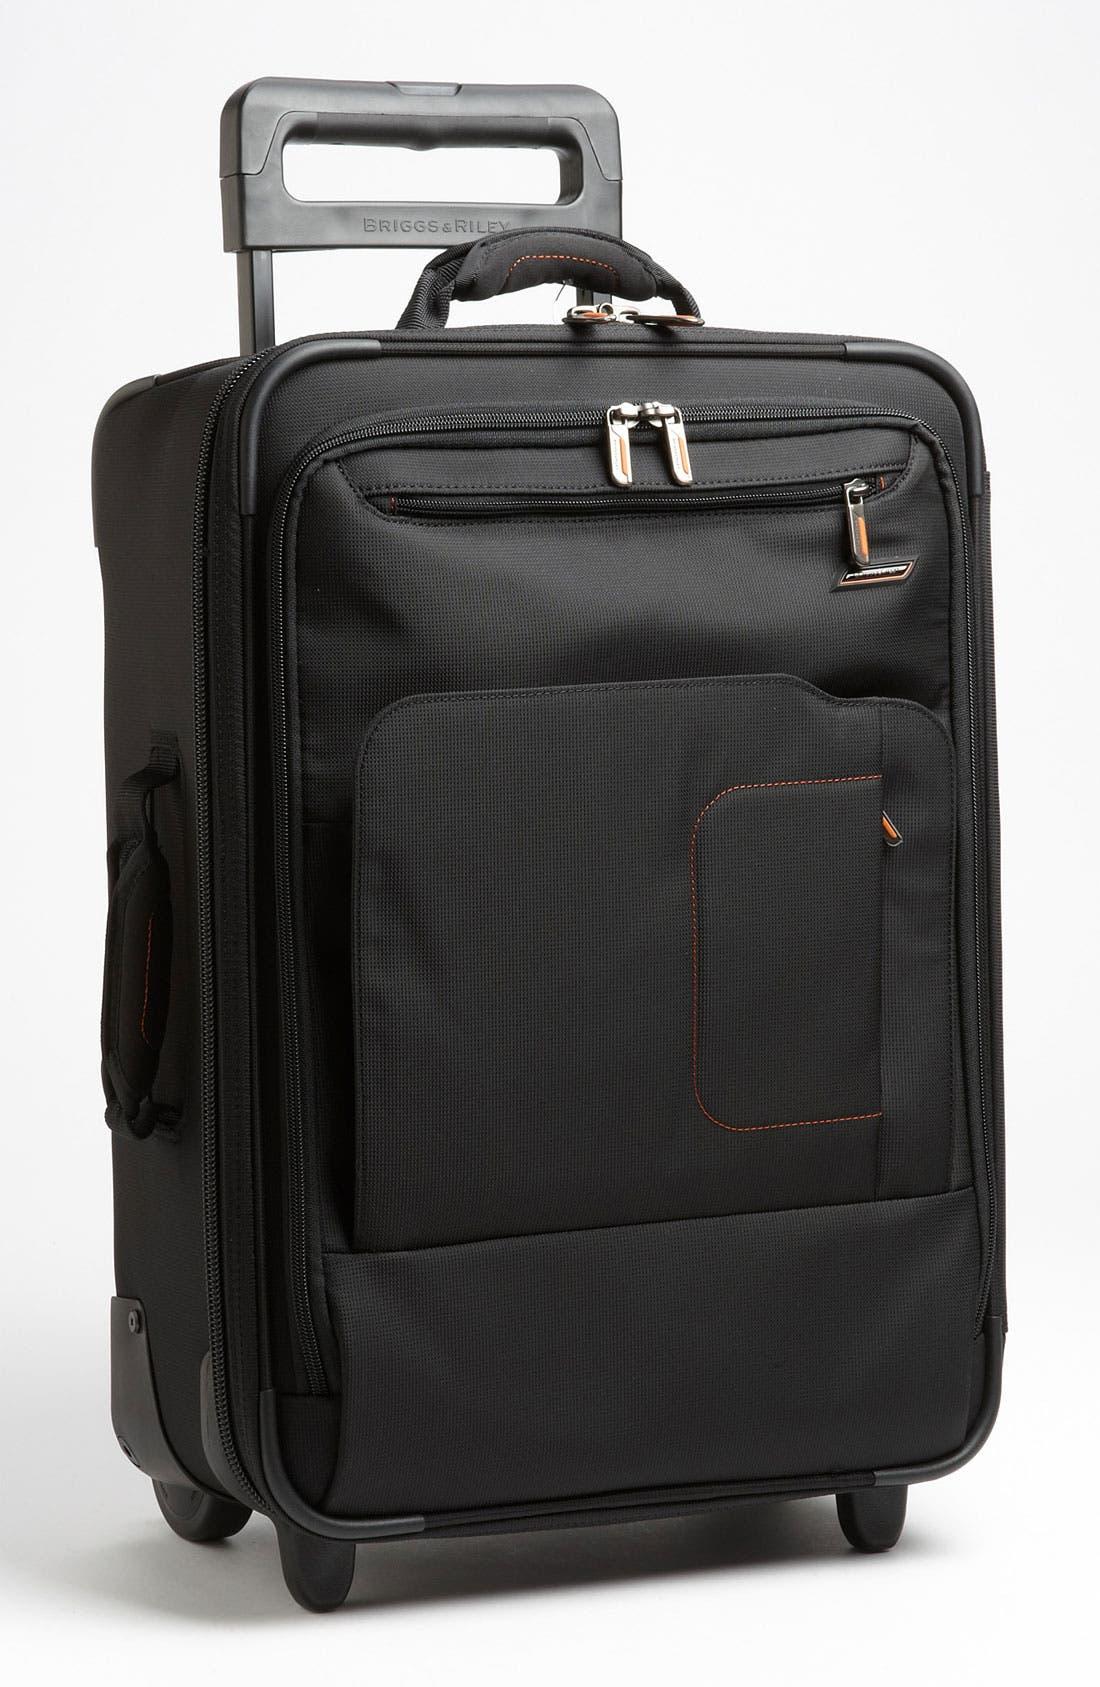 Main Image - Briggs & Riley 'Verb - Fuse' Upright Suitcase (20 Inch)